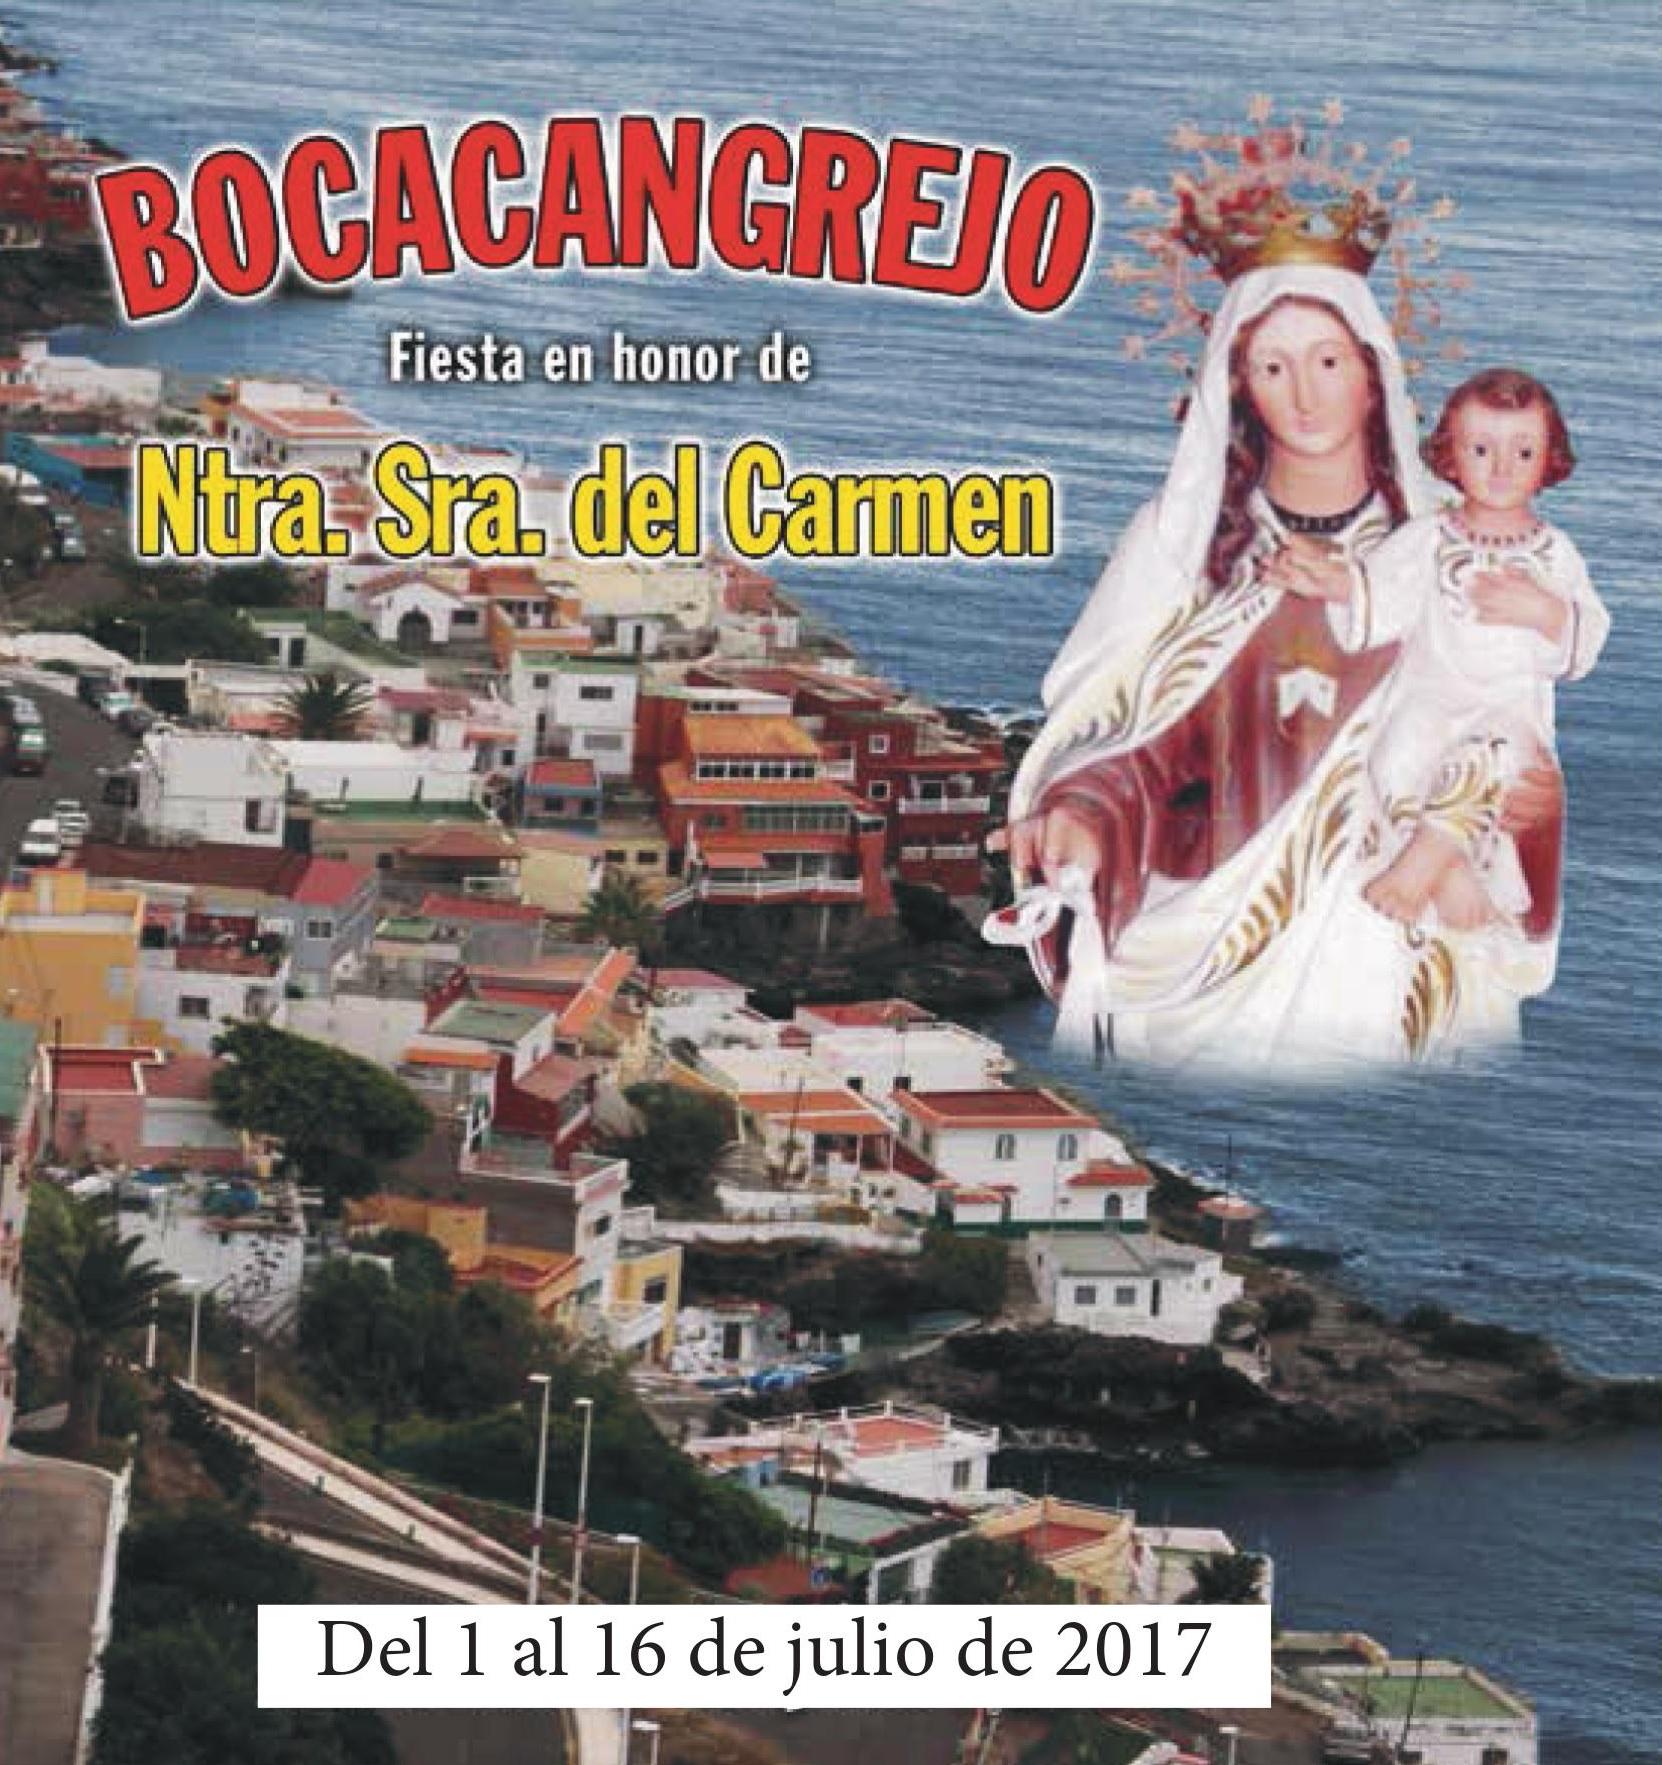 Fiestas del Carmen Bocacangrejo